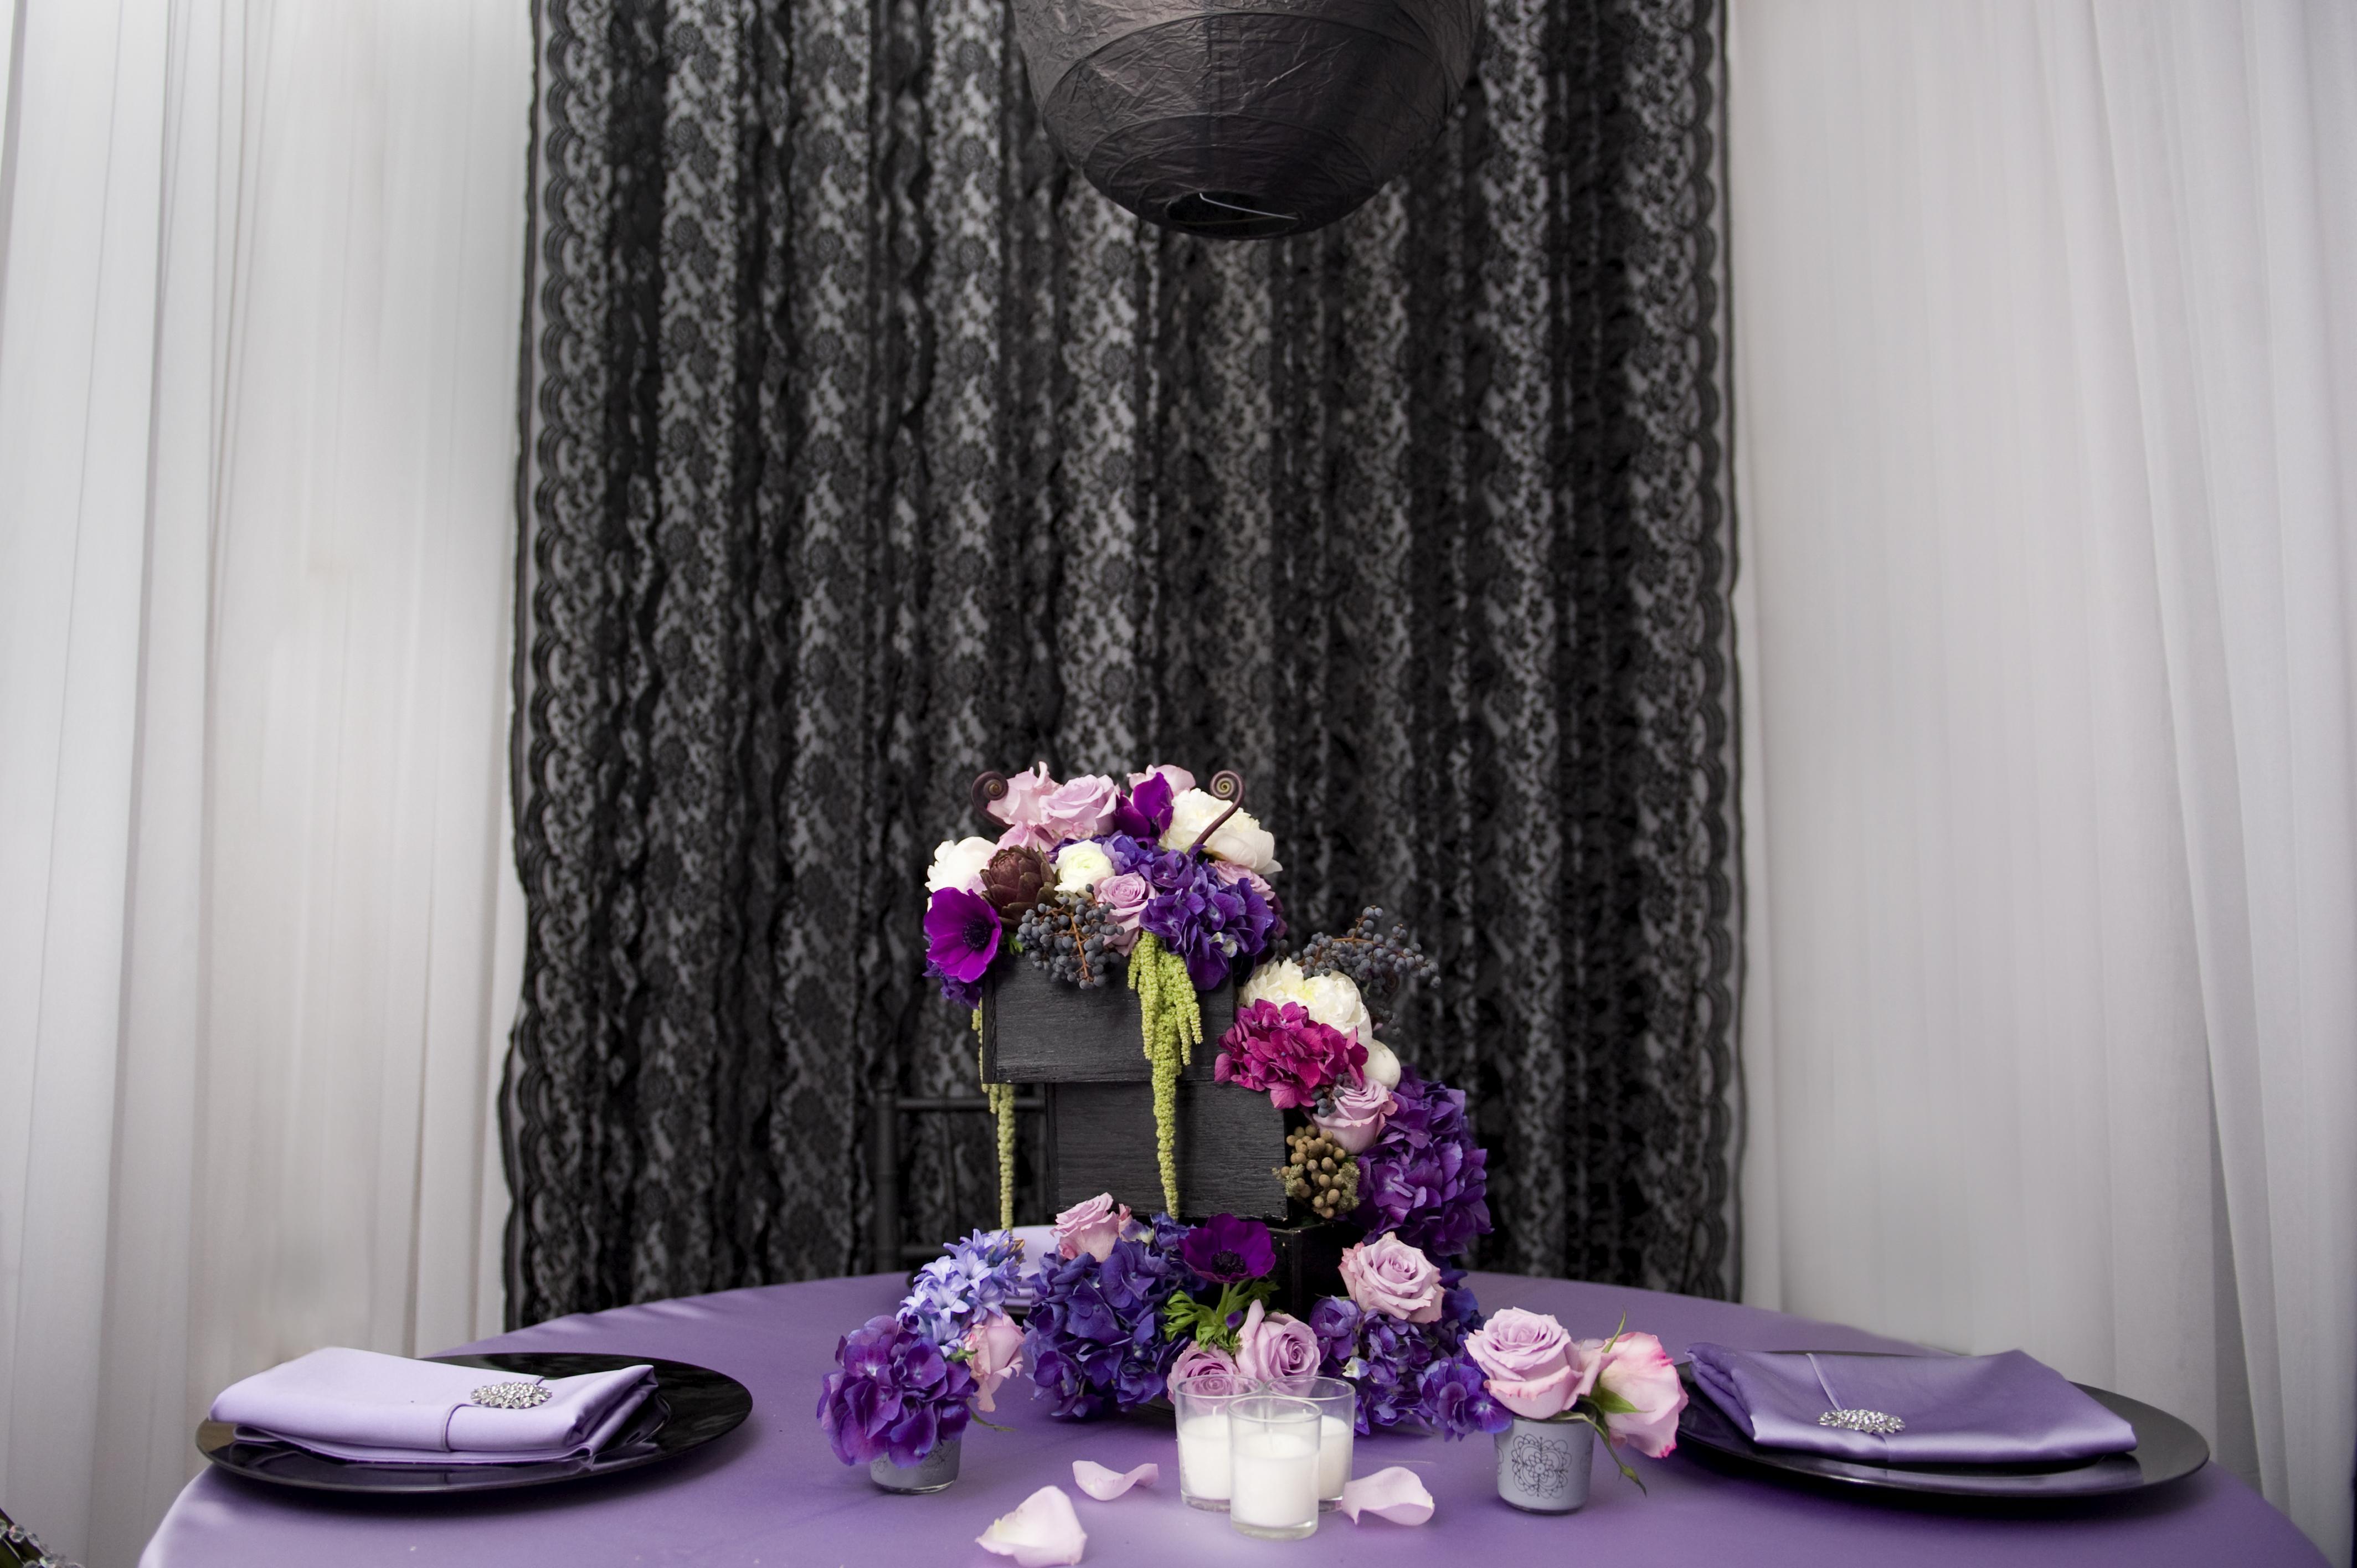 Ceremony, Reception, Flowers & Decor, purple, Ceremony Flowers, Centerpieces, Flowers, Centerpiece, Jadore florist